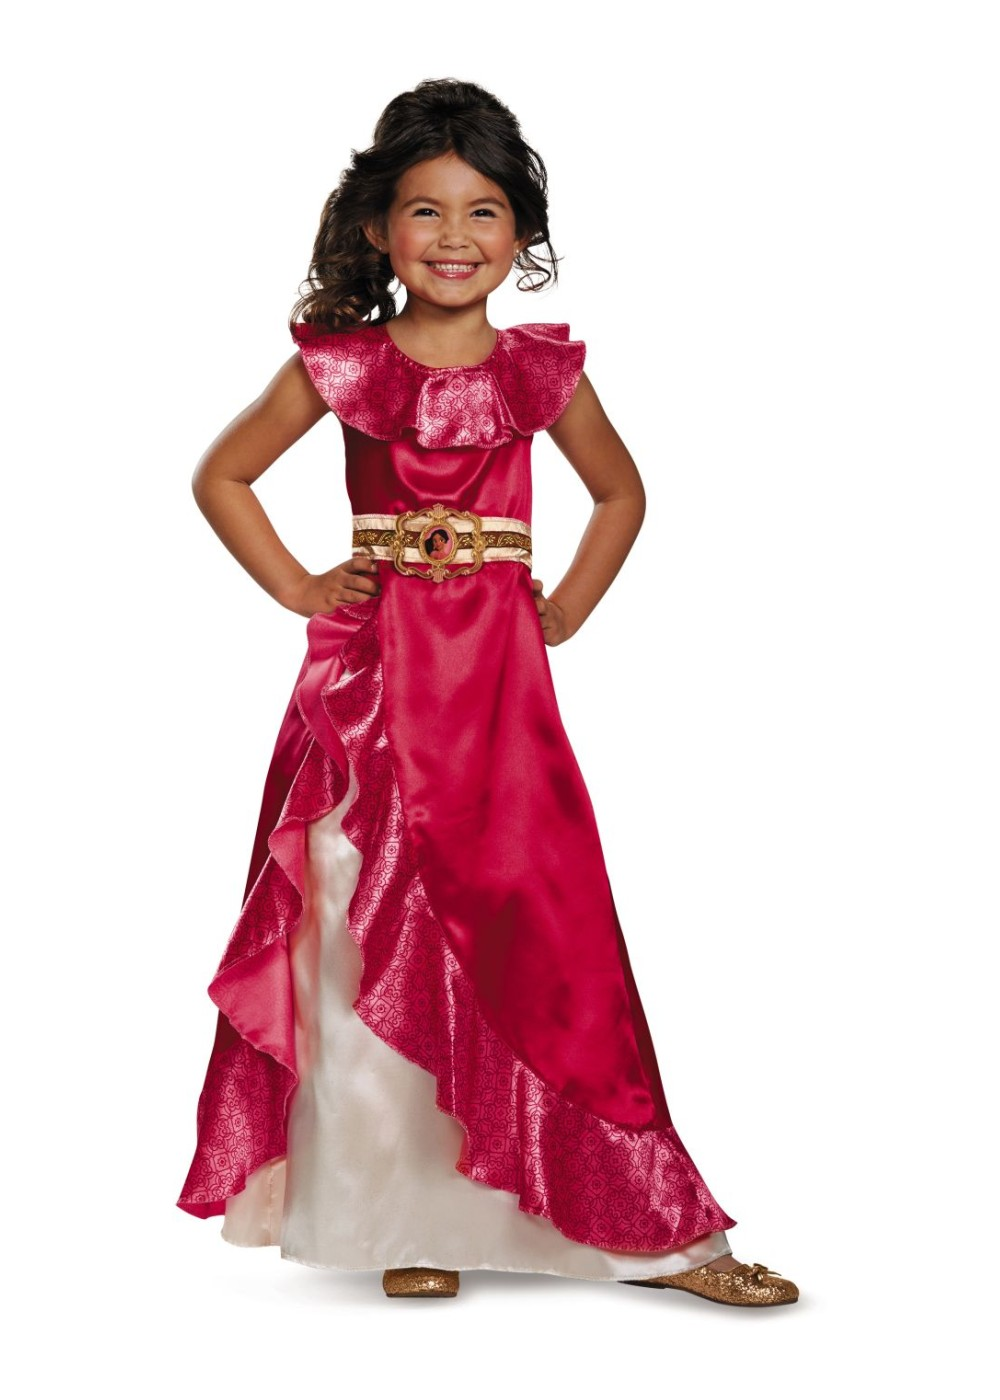 Elena Adventure Dress Classic Girl Costume - Princess Costumes